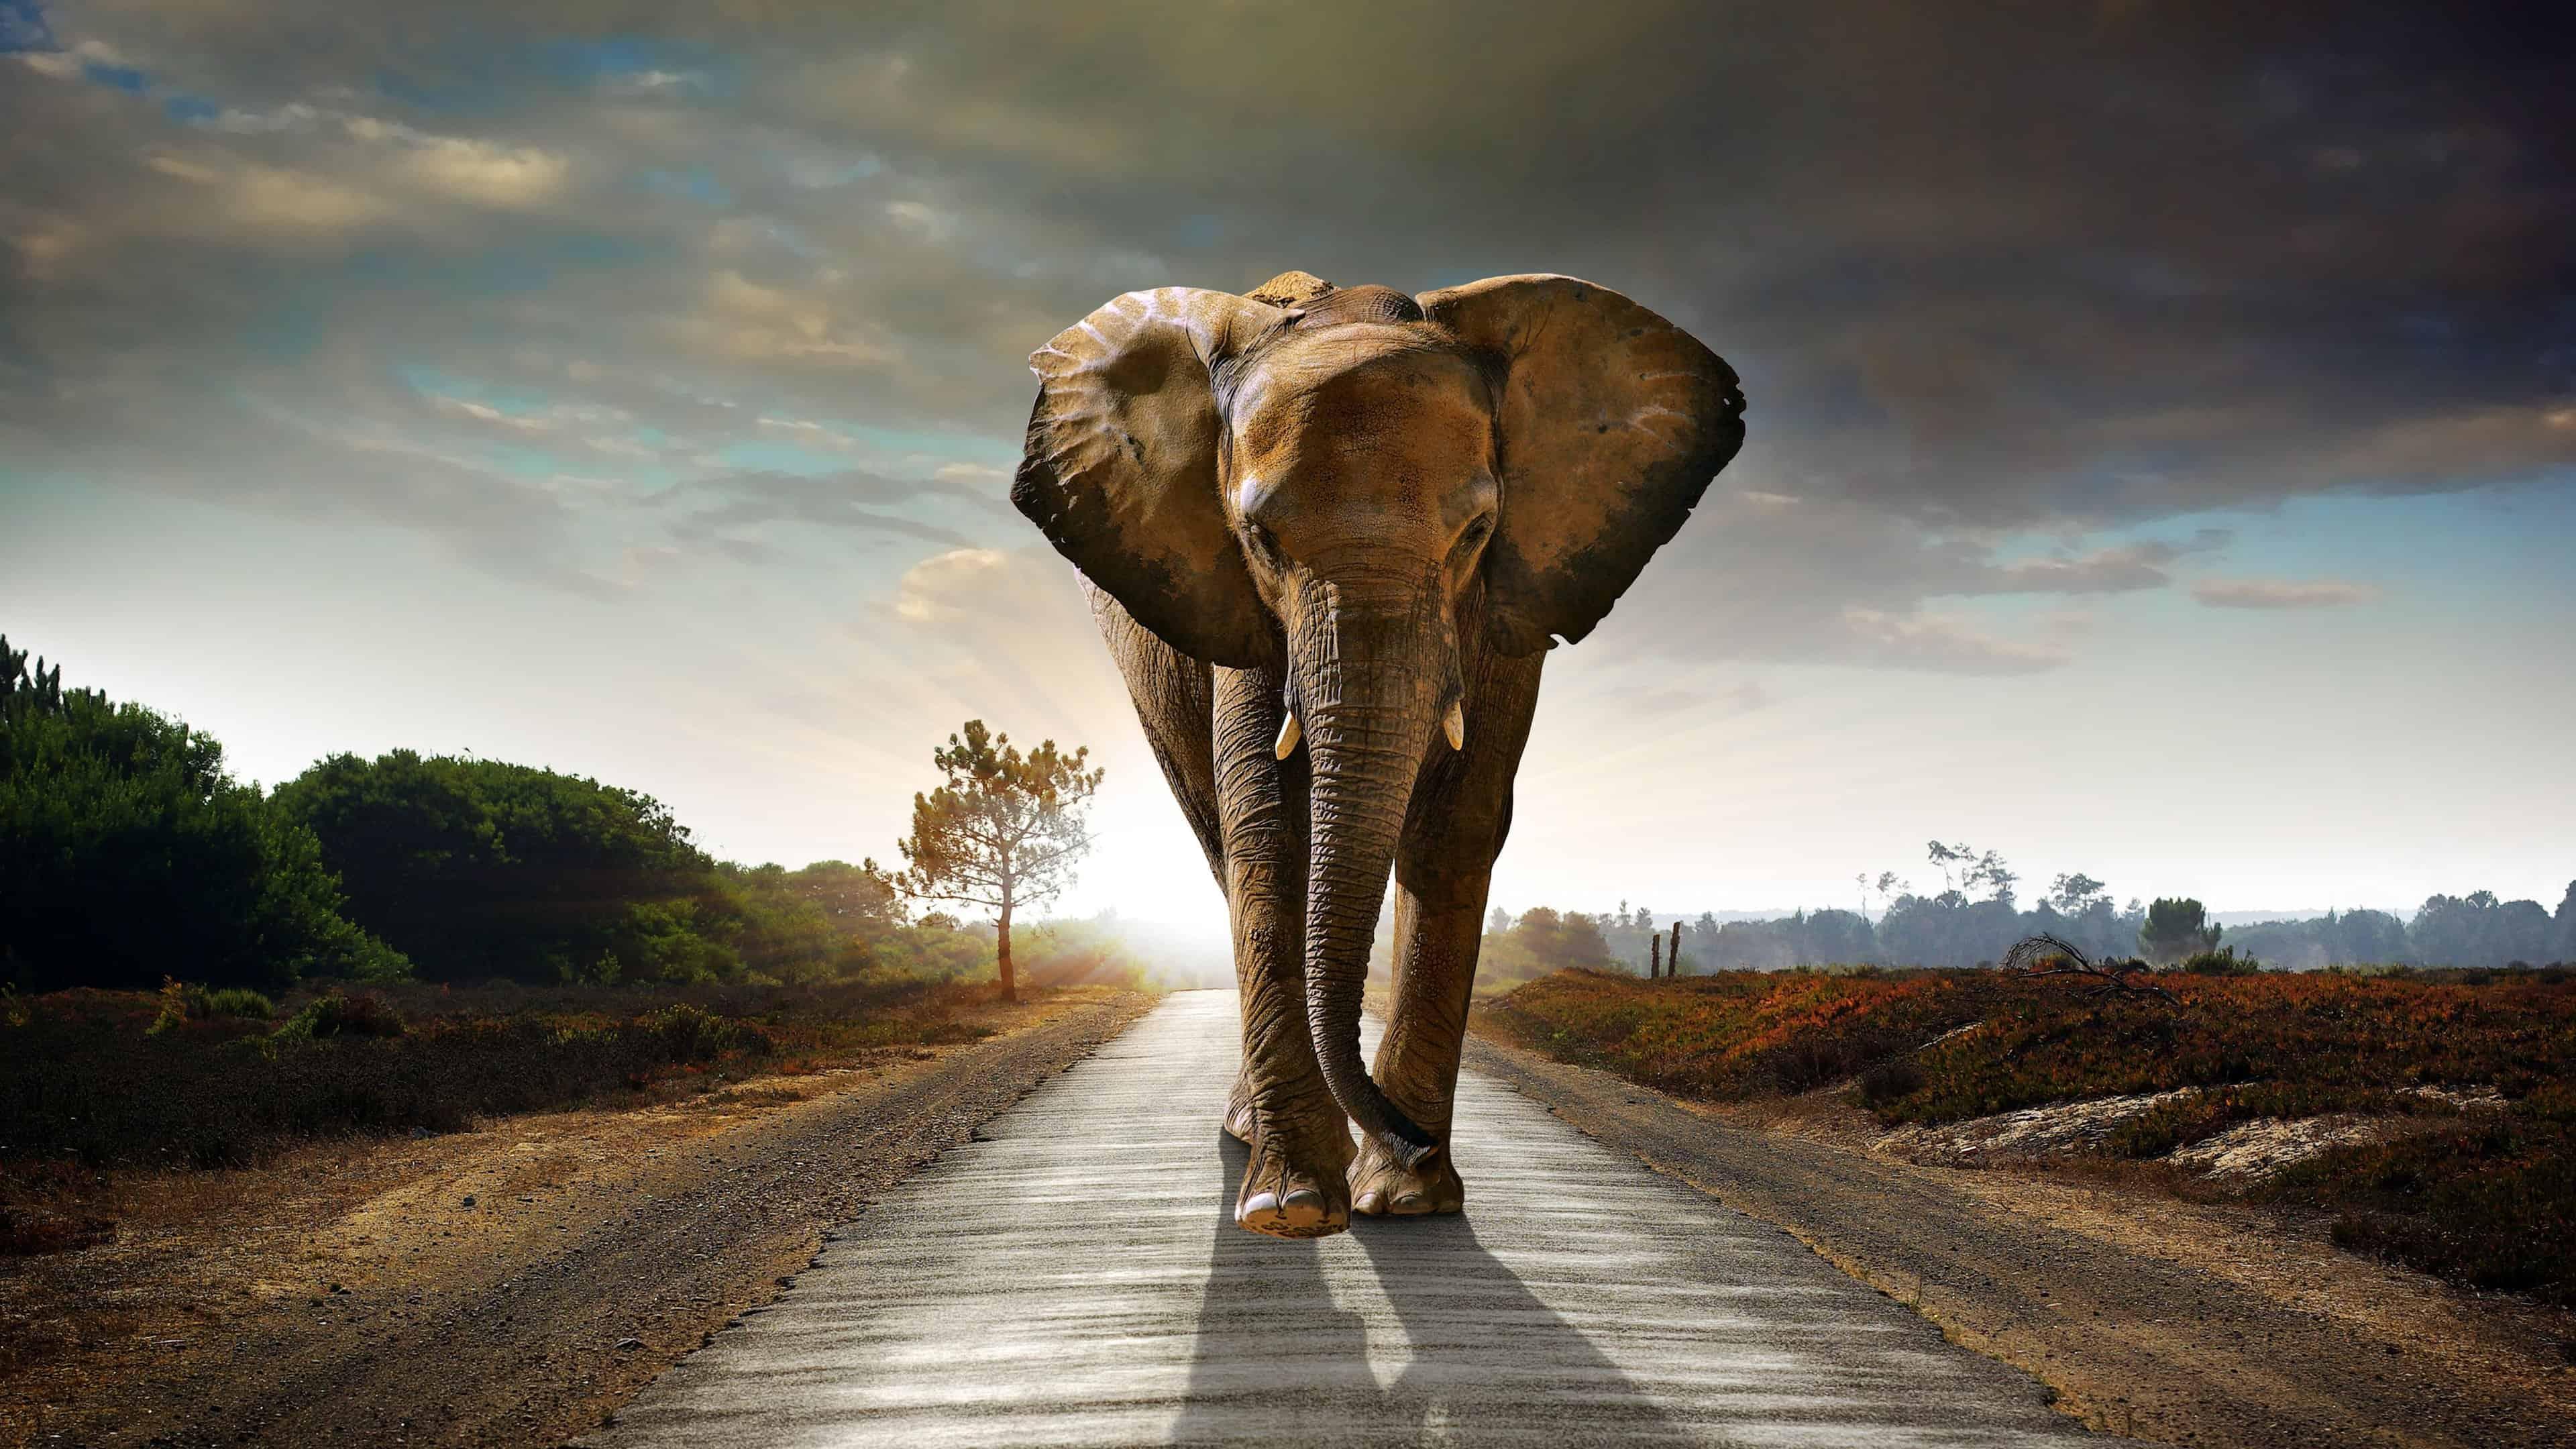 elephant walking on the road uhd 4k wallpaper